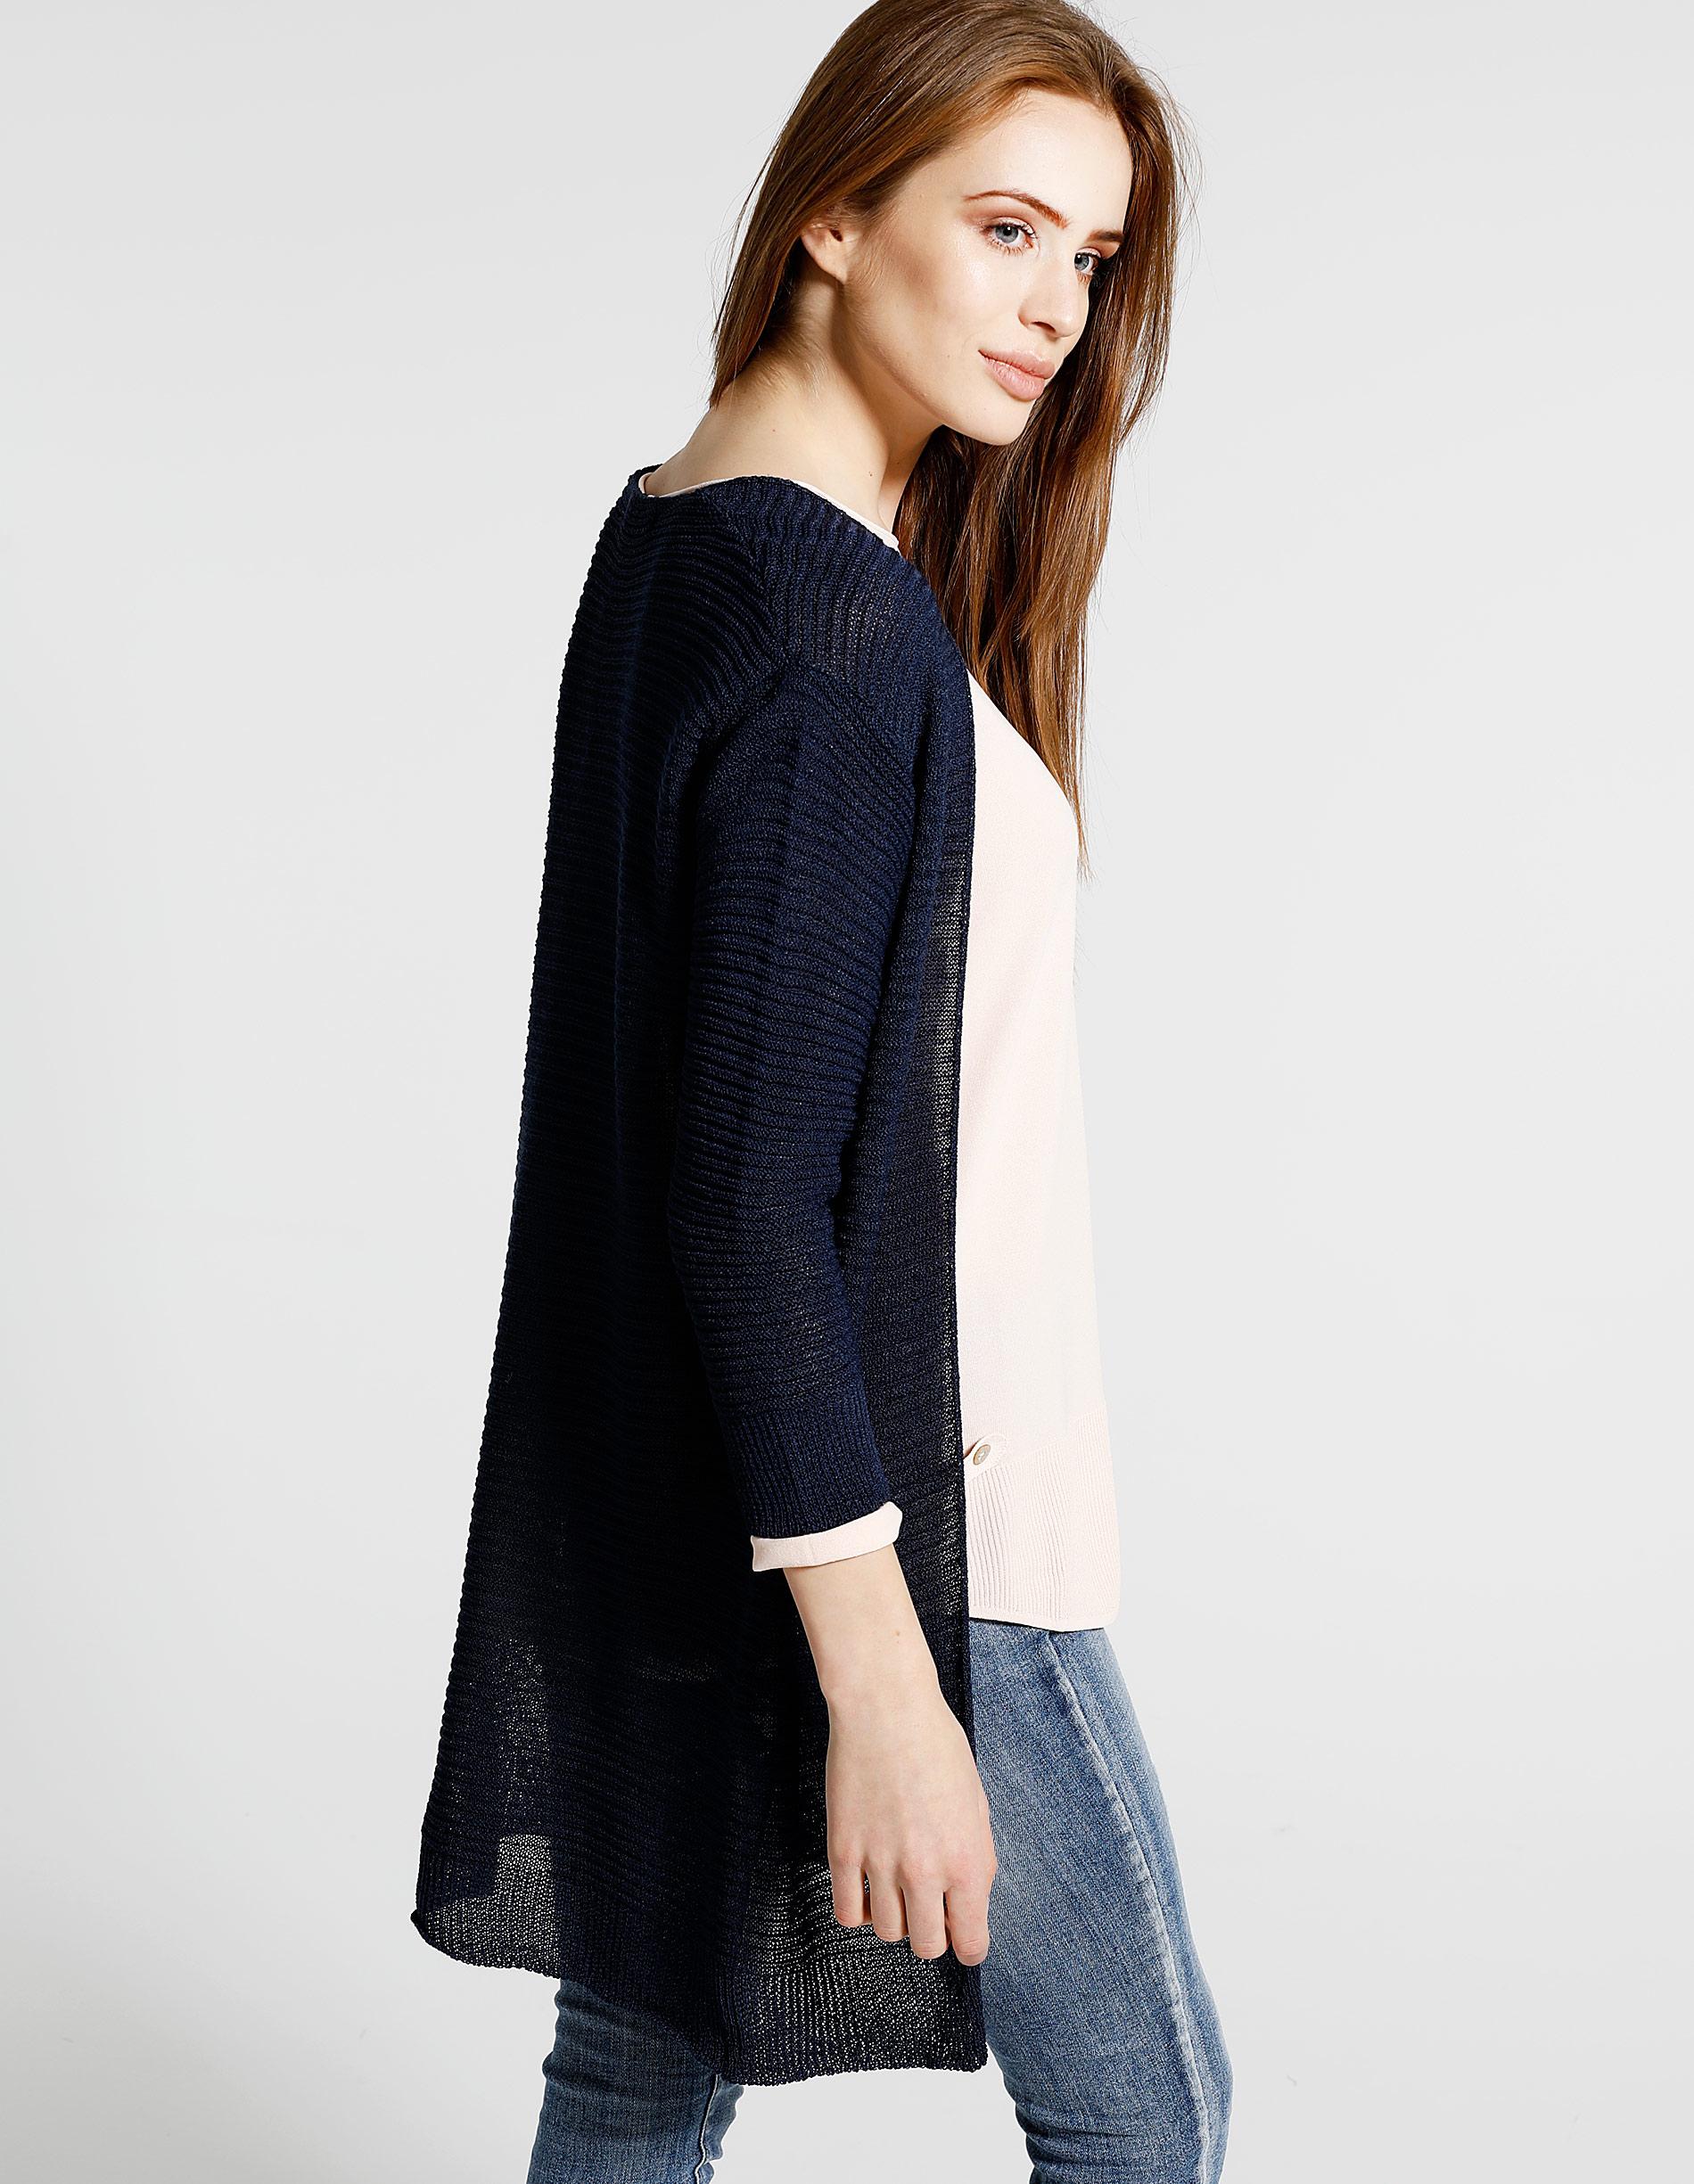 Sweter - 167-1601 BLSC - Unisono